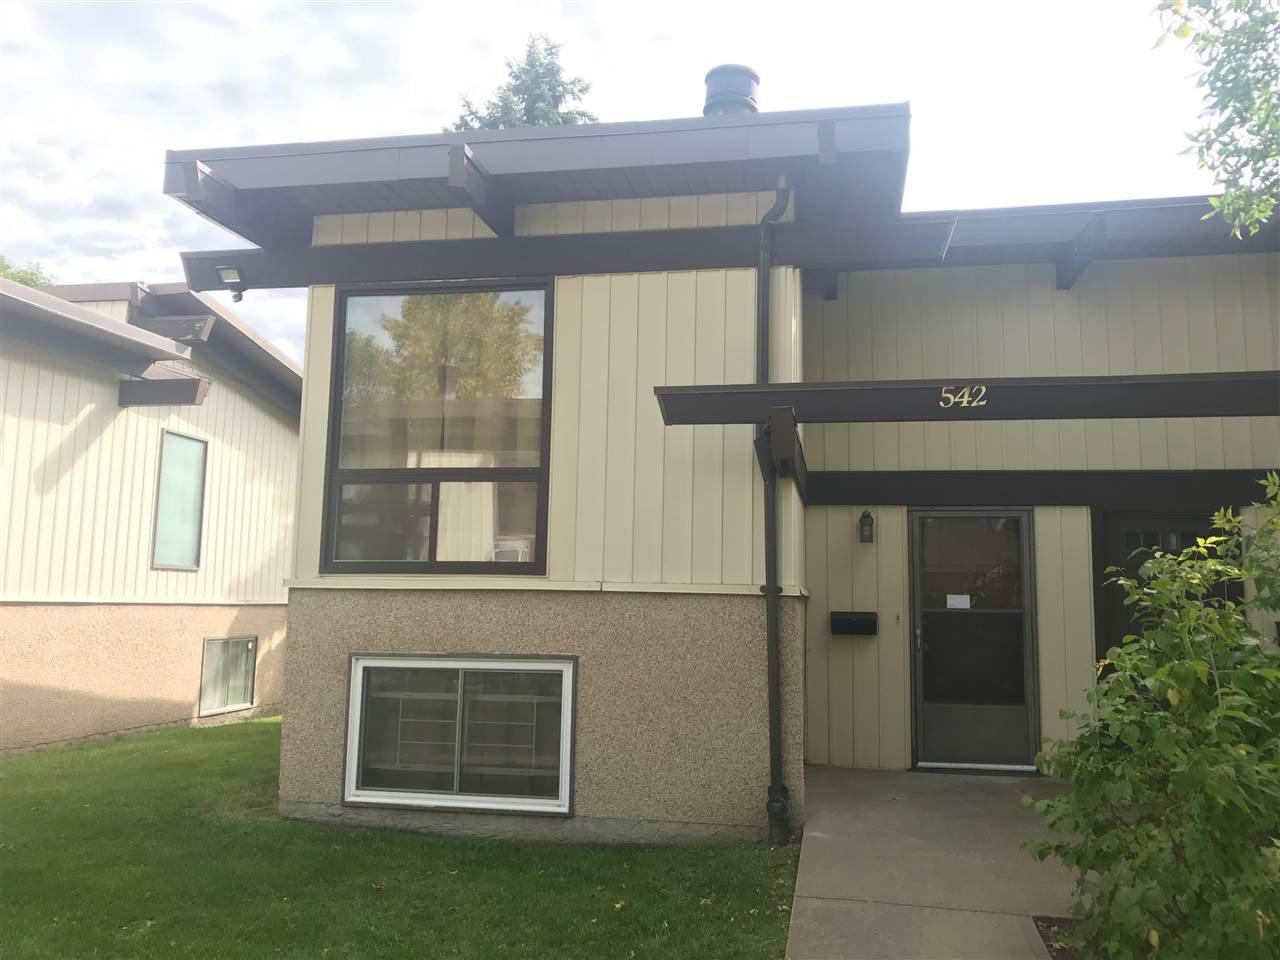 Main Photo: 542 LEE_RIDGE Road in Edmonton: Zone 29 House Half Duplex for sale : MLS®# E4204592